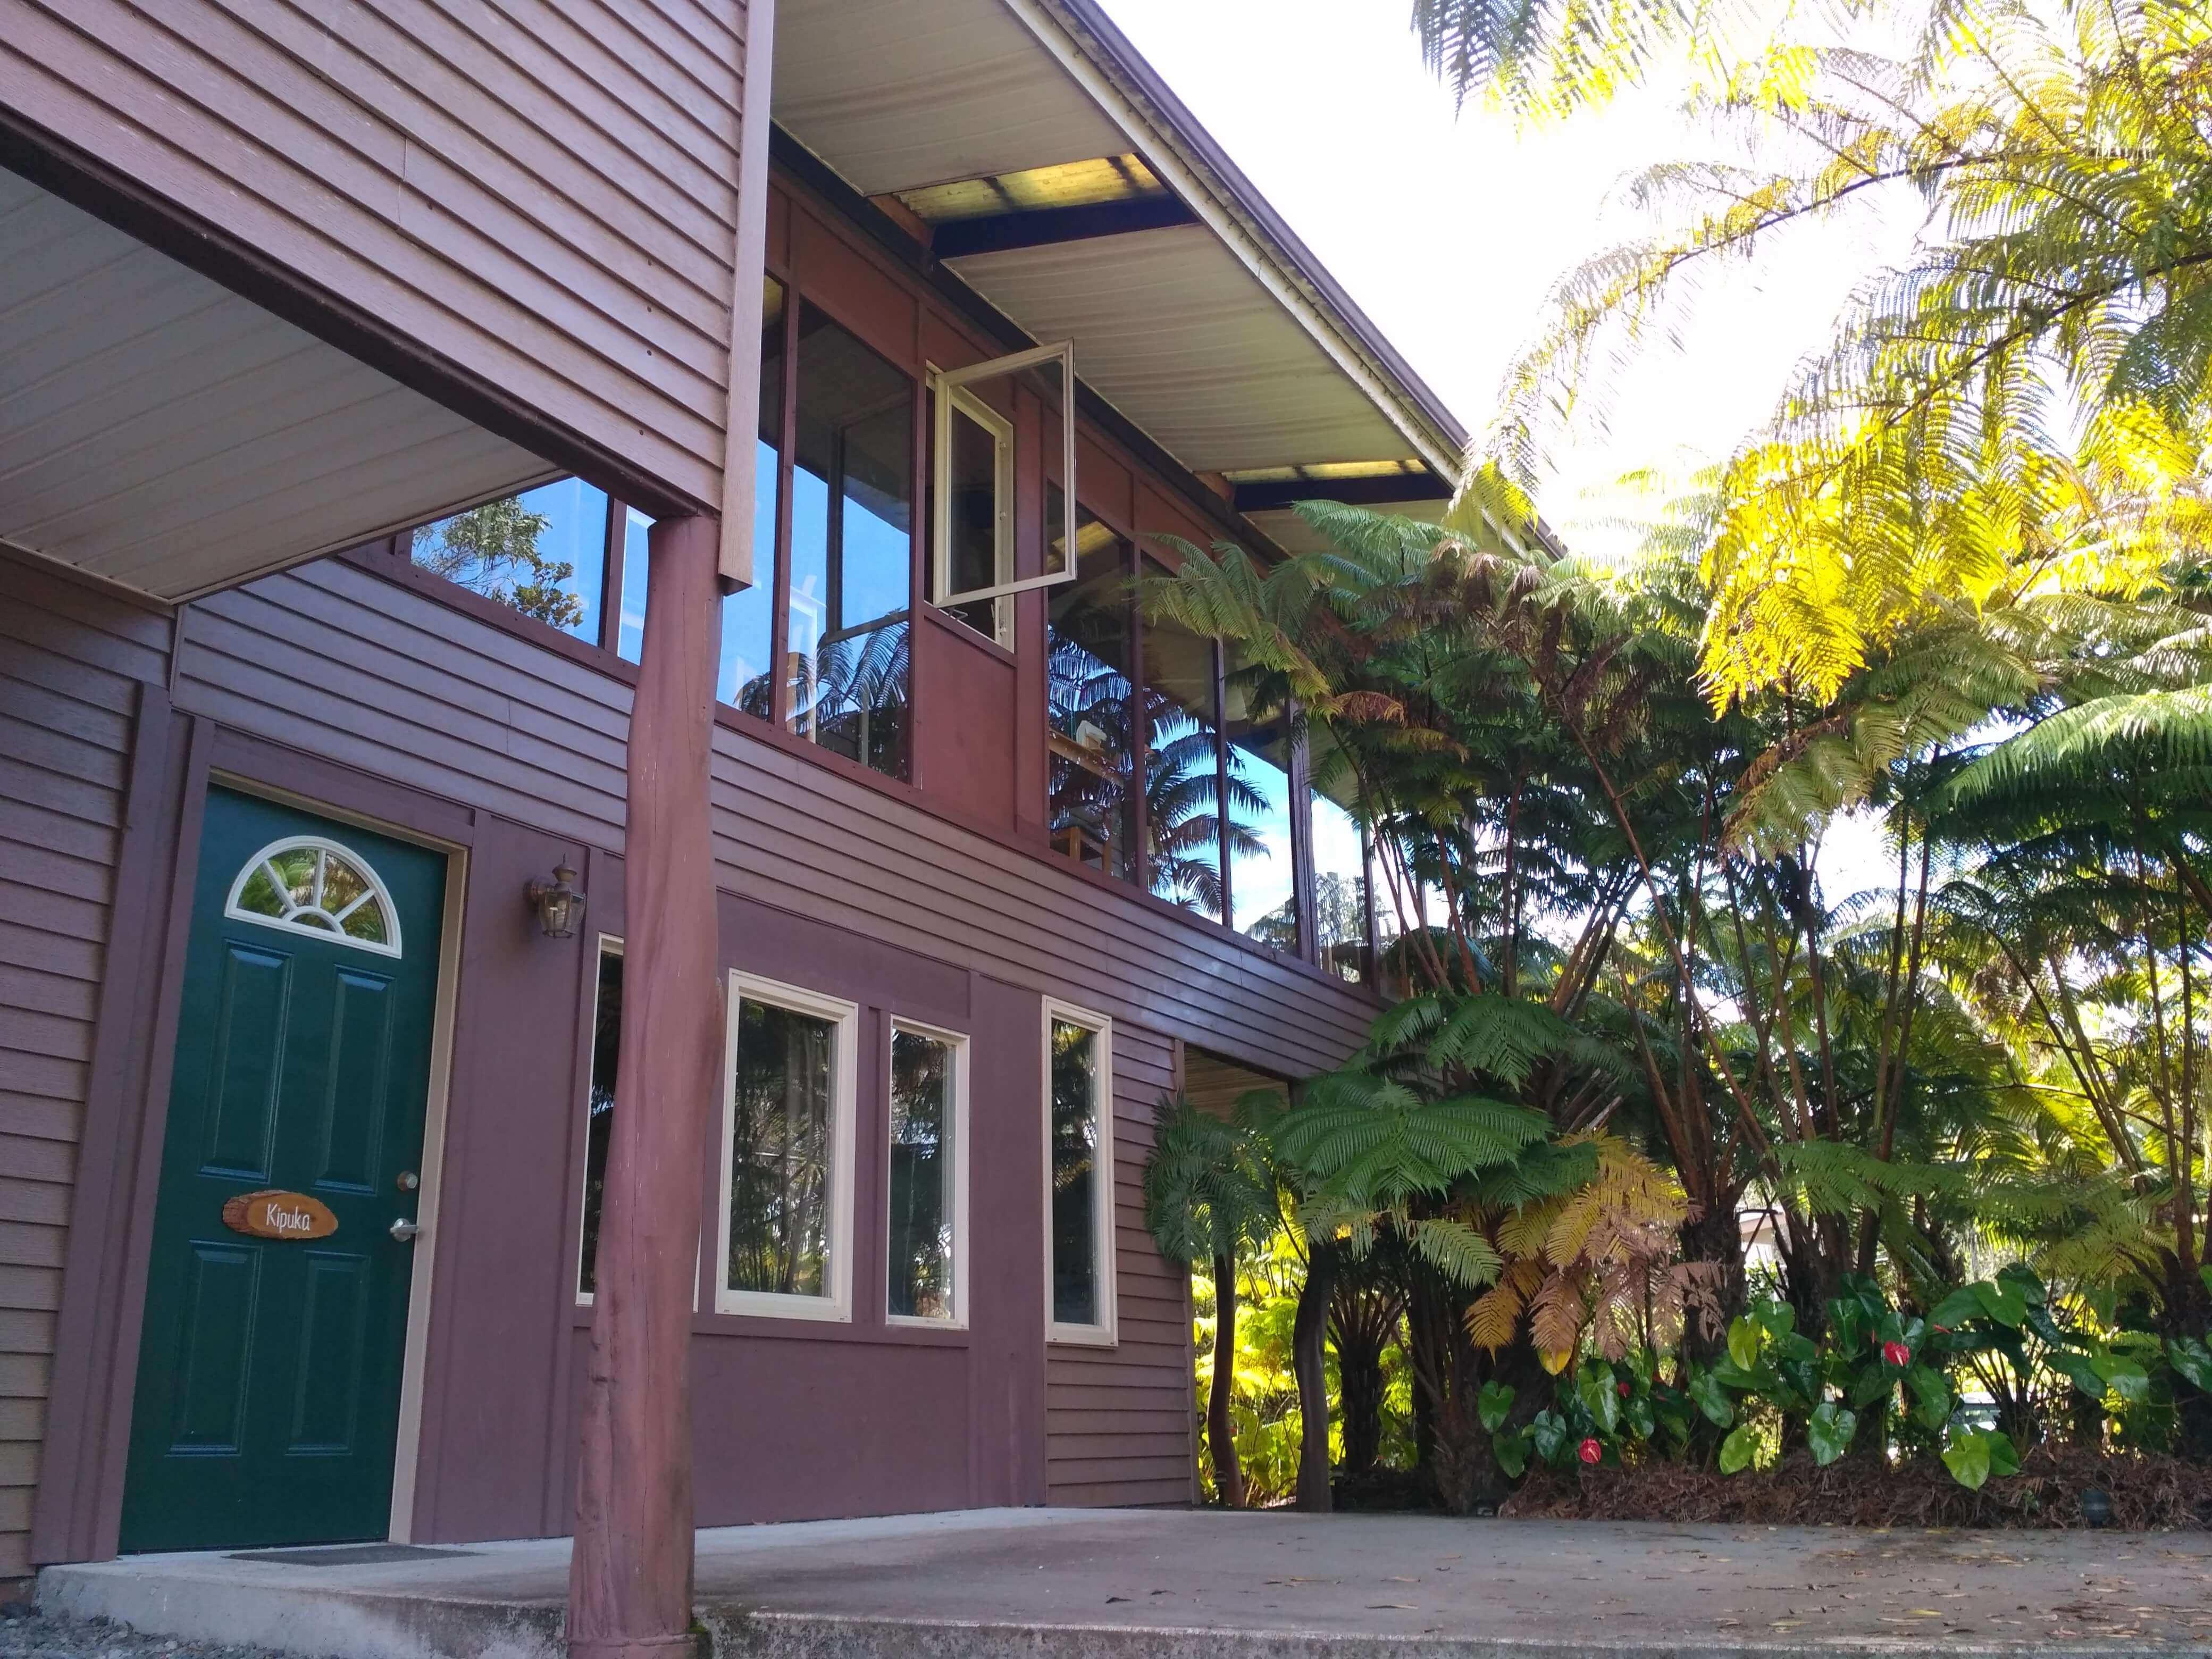 Kilauea hotel-volcano inn - building outside